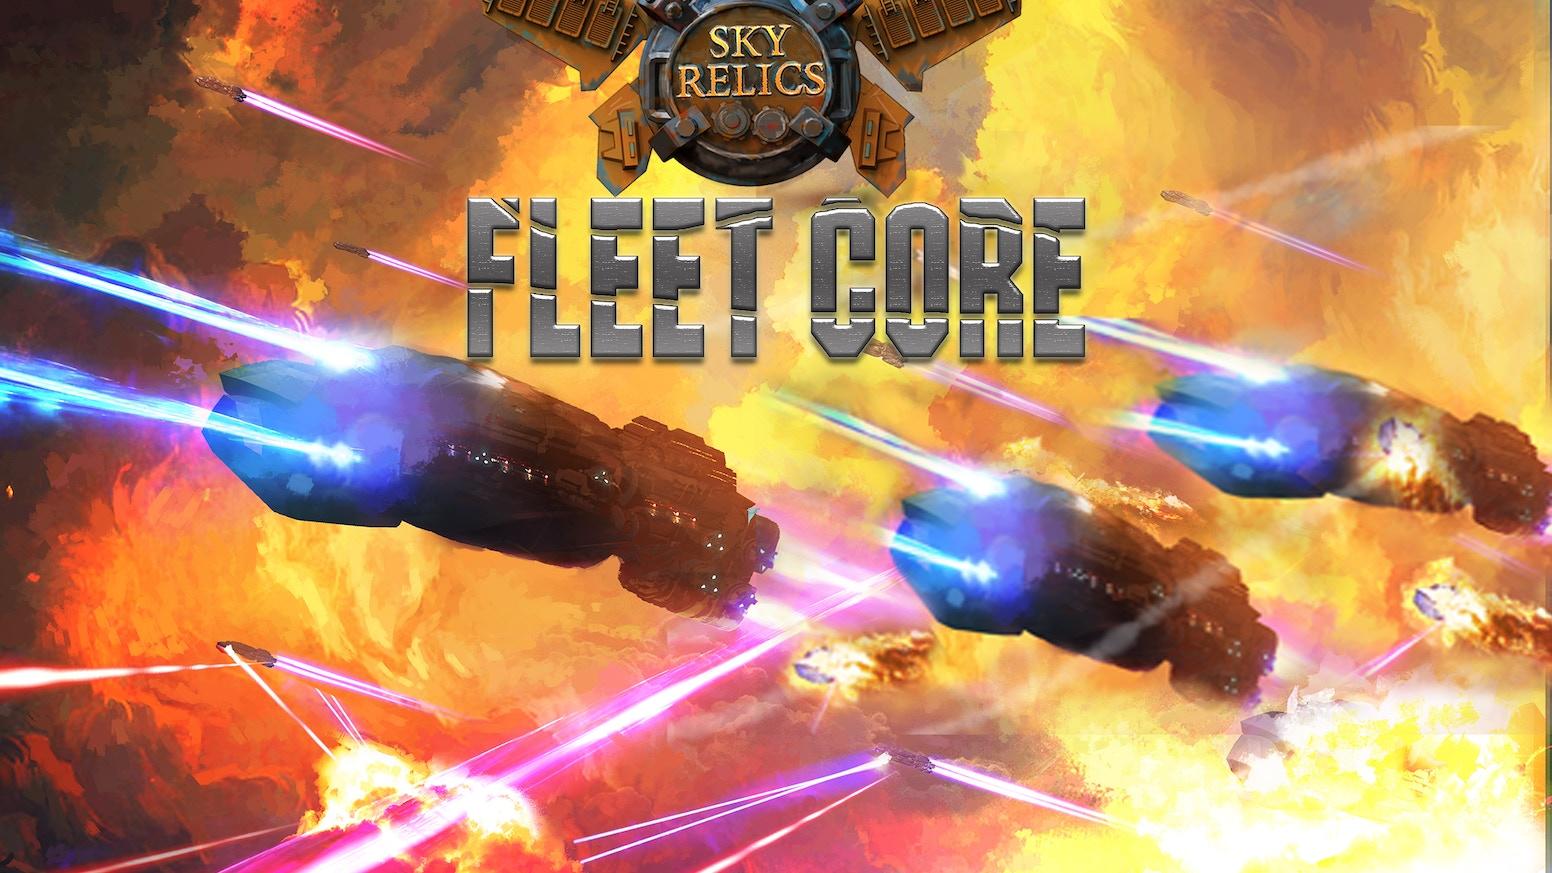 Sky Relics Fleet Core by Sky Relics Games LLC — Kickstarter